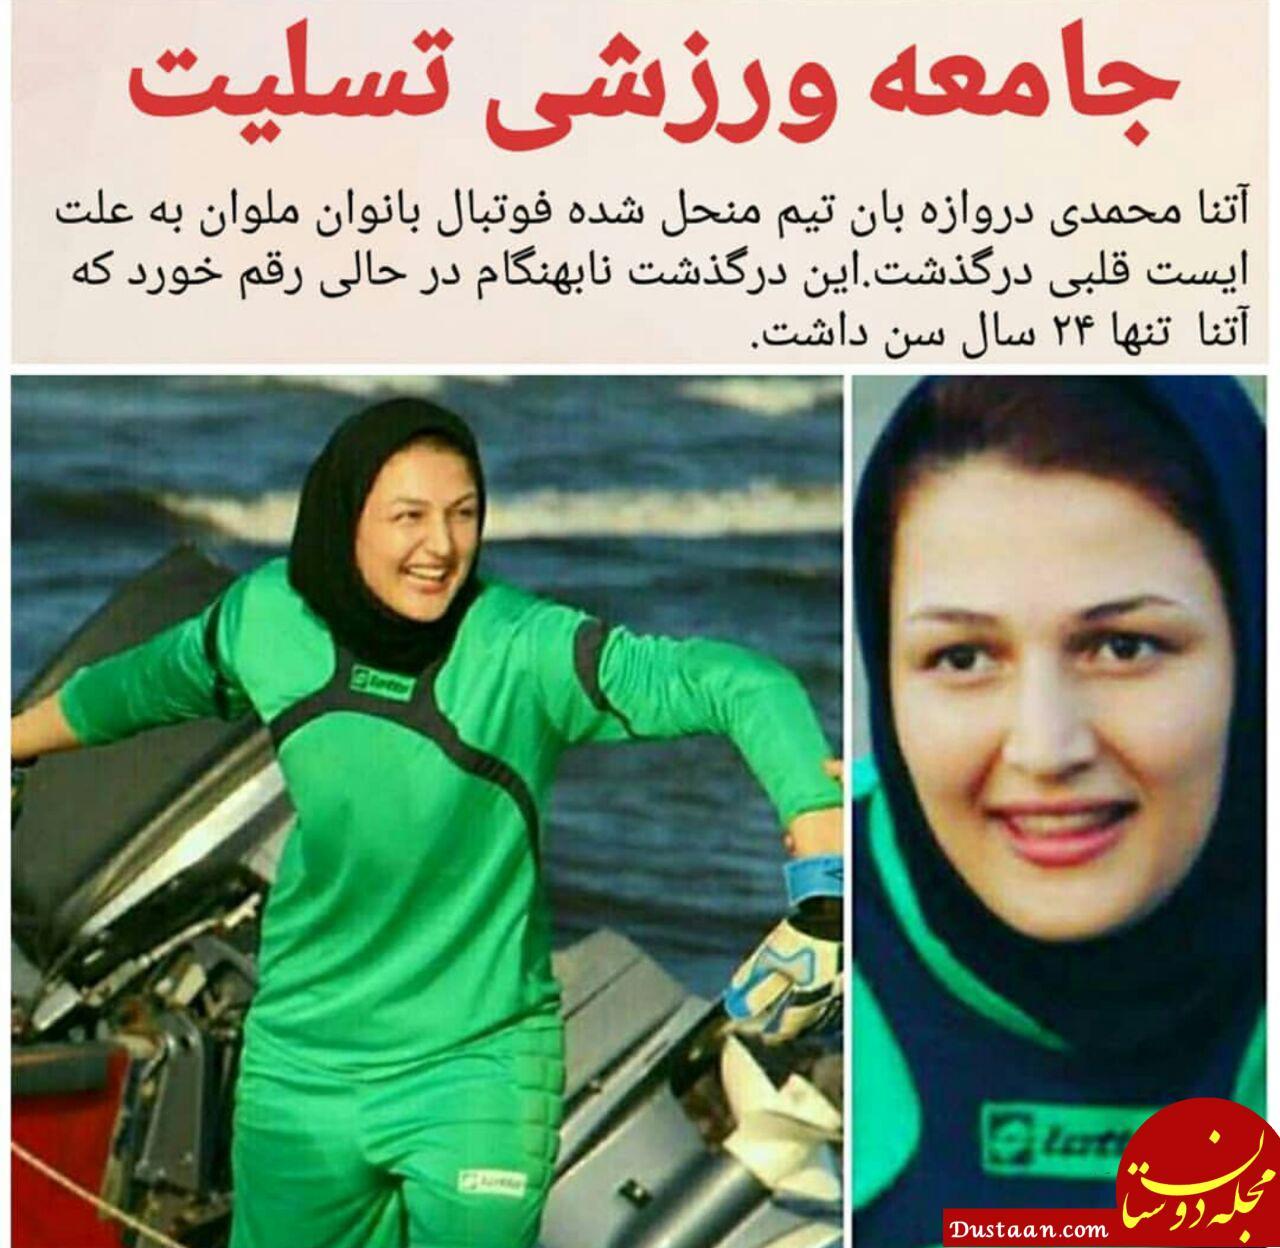 www.dustaan.com جزییات درگذشت آتنا محمدی به دلیل ایست قلبی+عکس